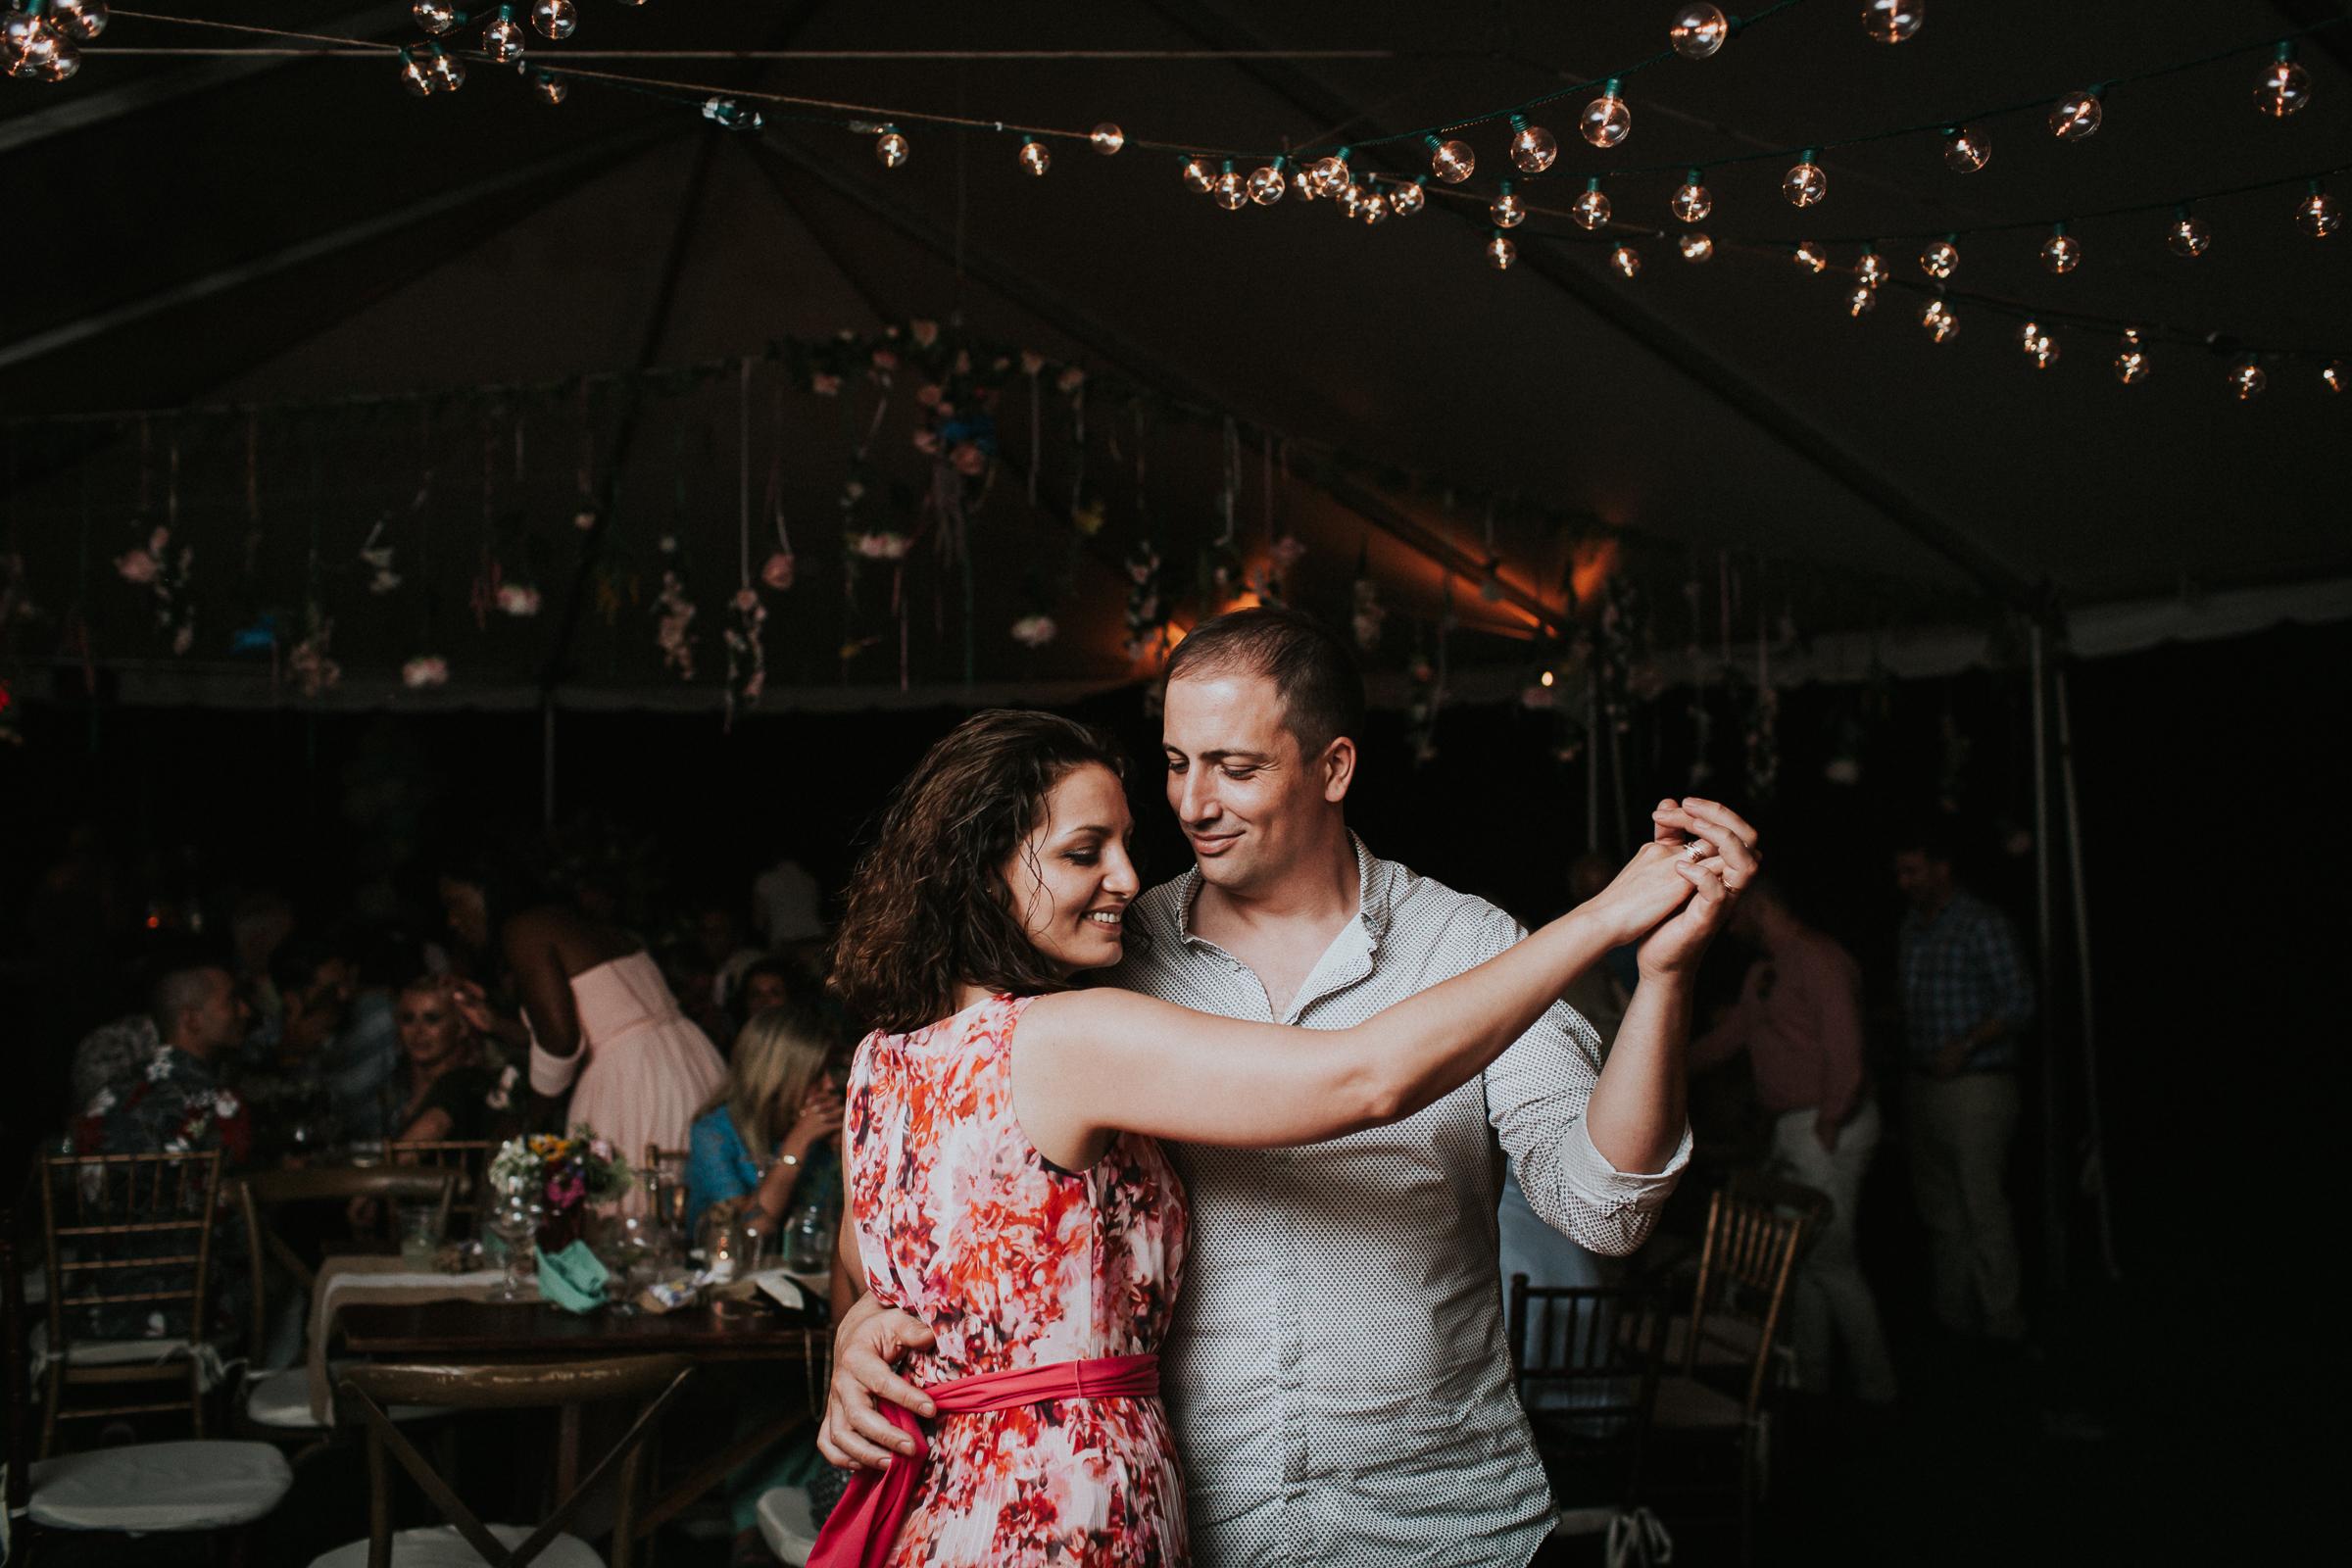 Backyard-Intimate-Adventurous-Destination-Wedding-Darien-Connecticut-Documentary-Wedding-Photography-120.jpg